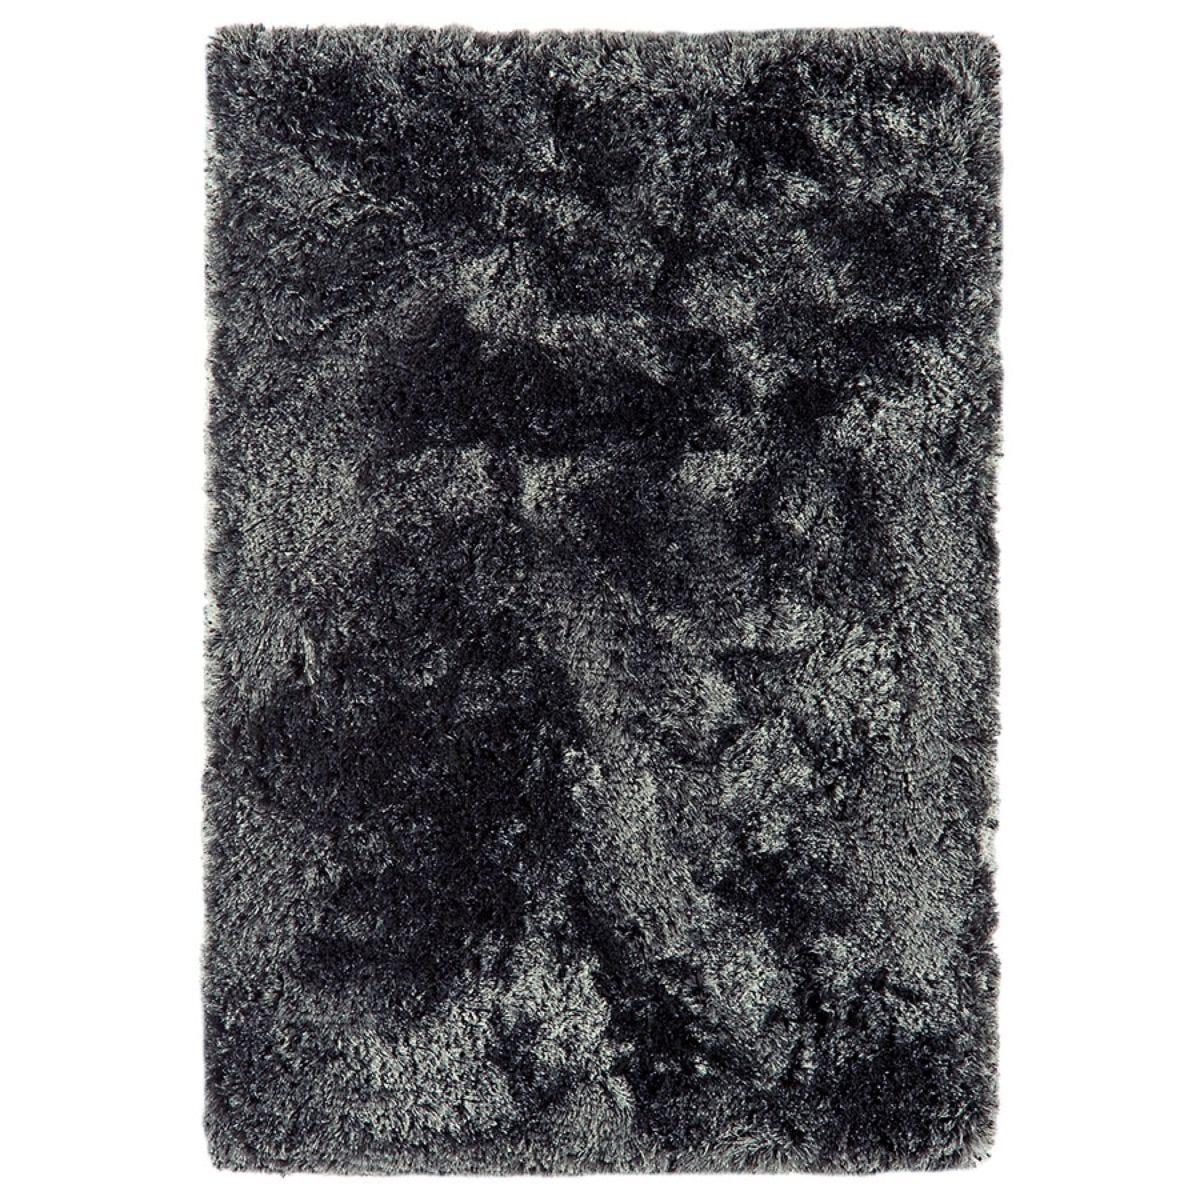 Asiatic Plush Shaggy Rug, 120 x 170cm - Slate